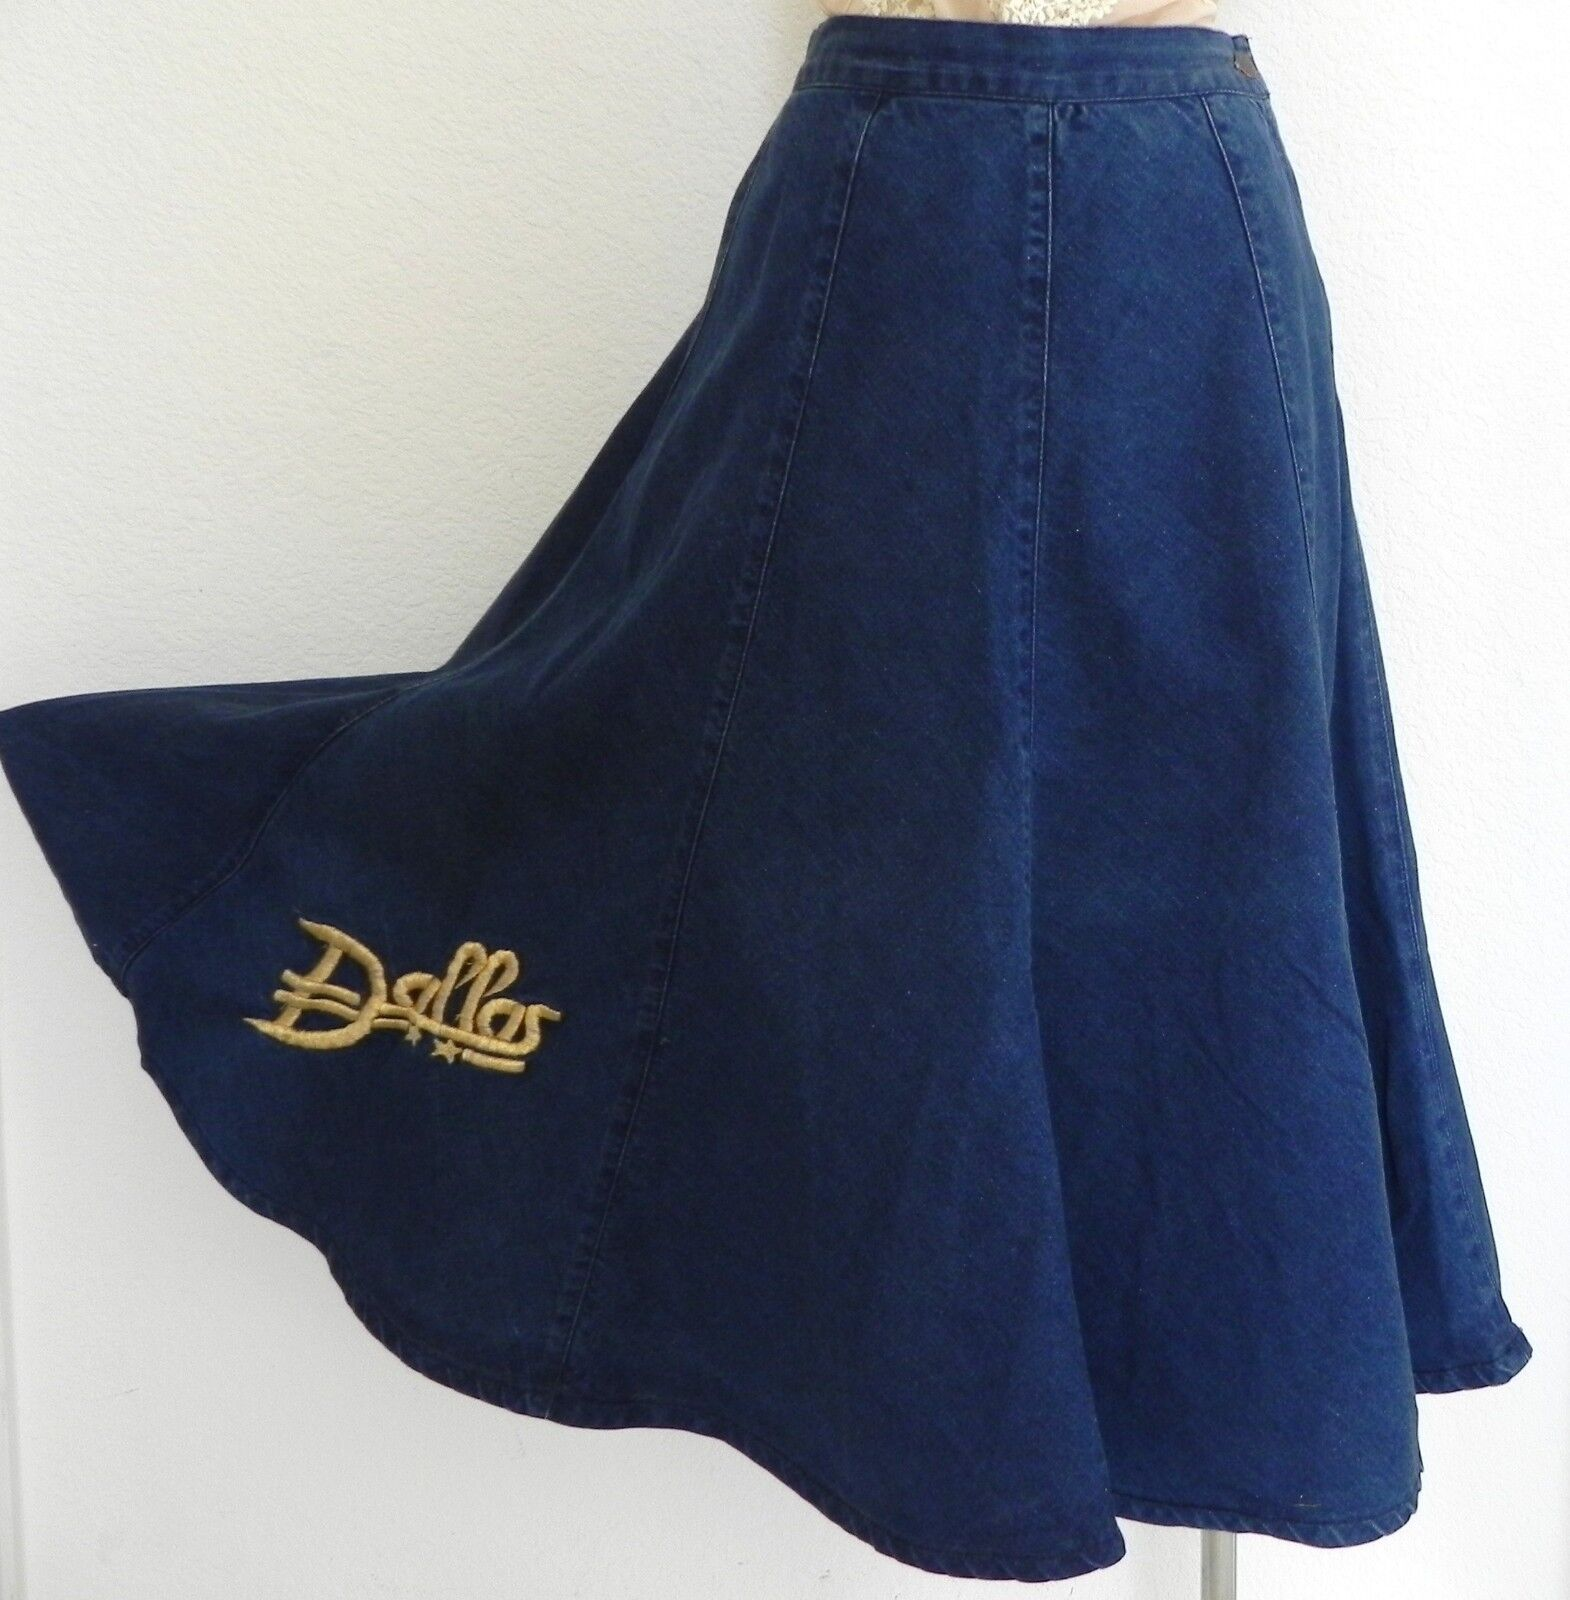 Vtg Vizette Vik denim Skirt Embroidered Dallas Logo Flared A-Line Swing Size XS